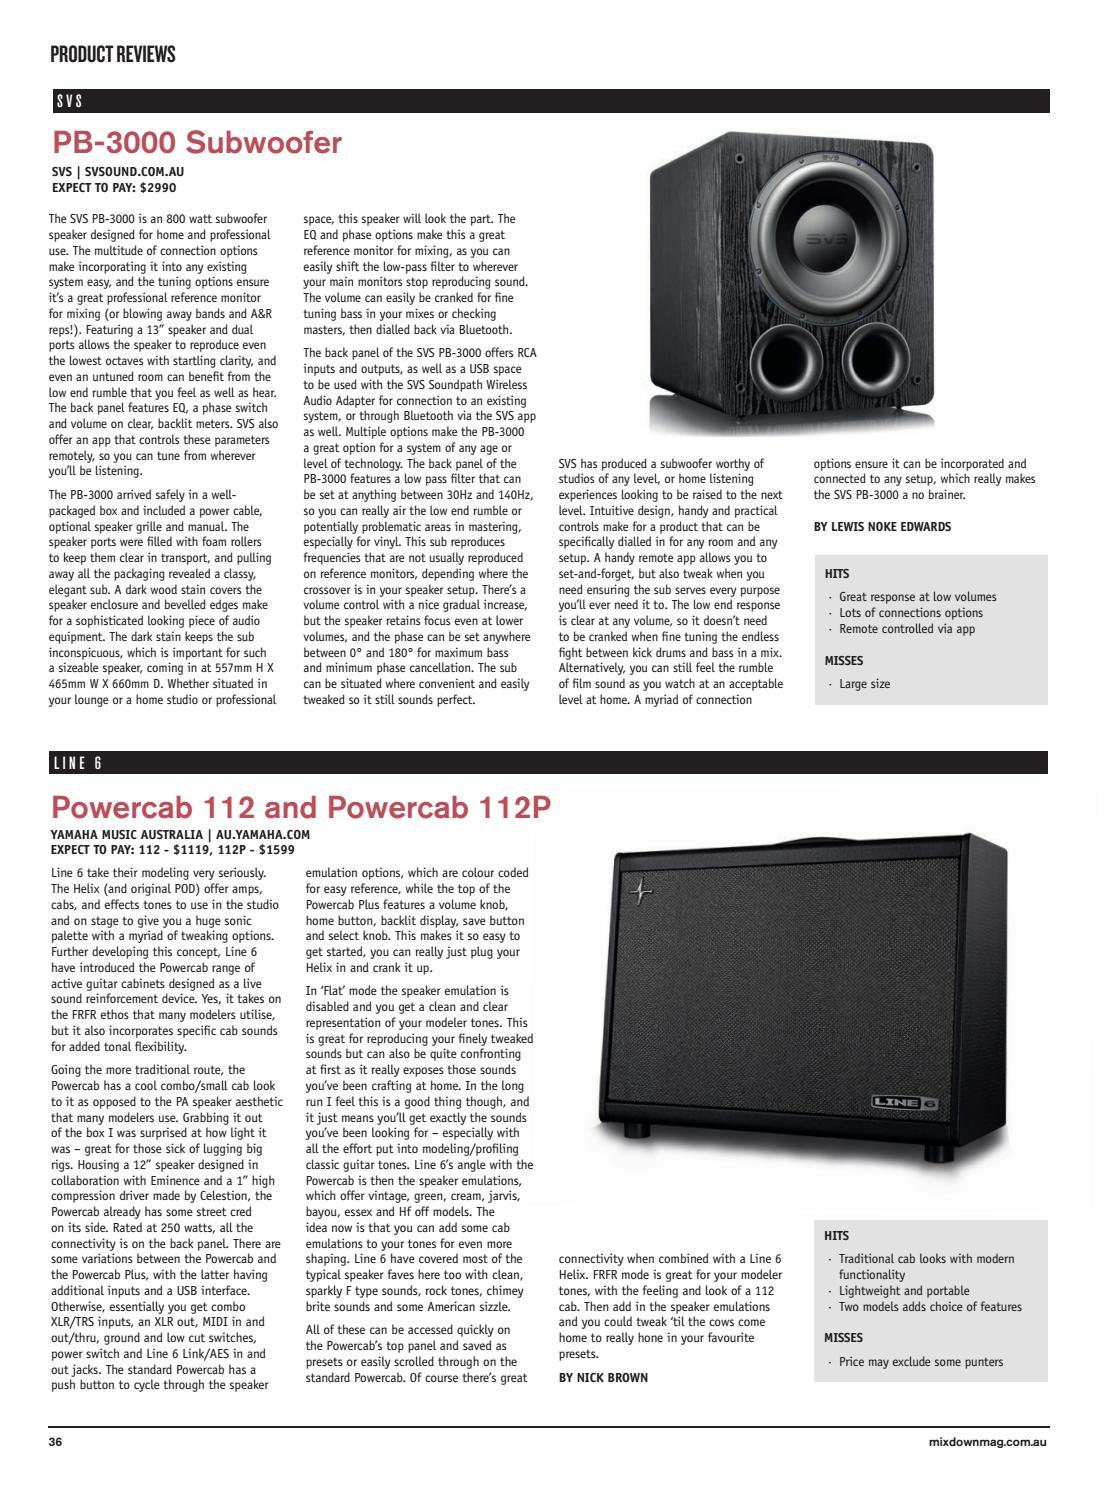 Mixdown Magazine 298 by Furst Media - issuu